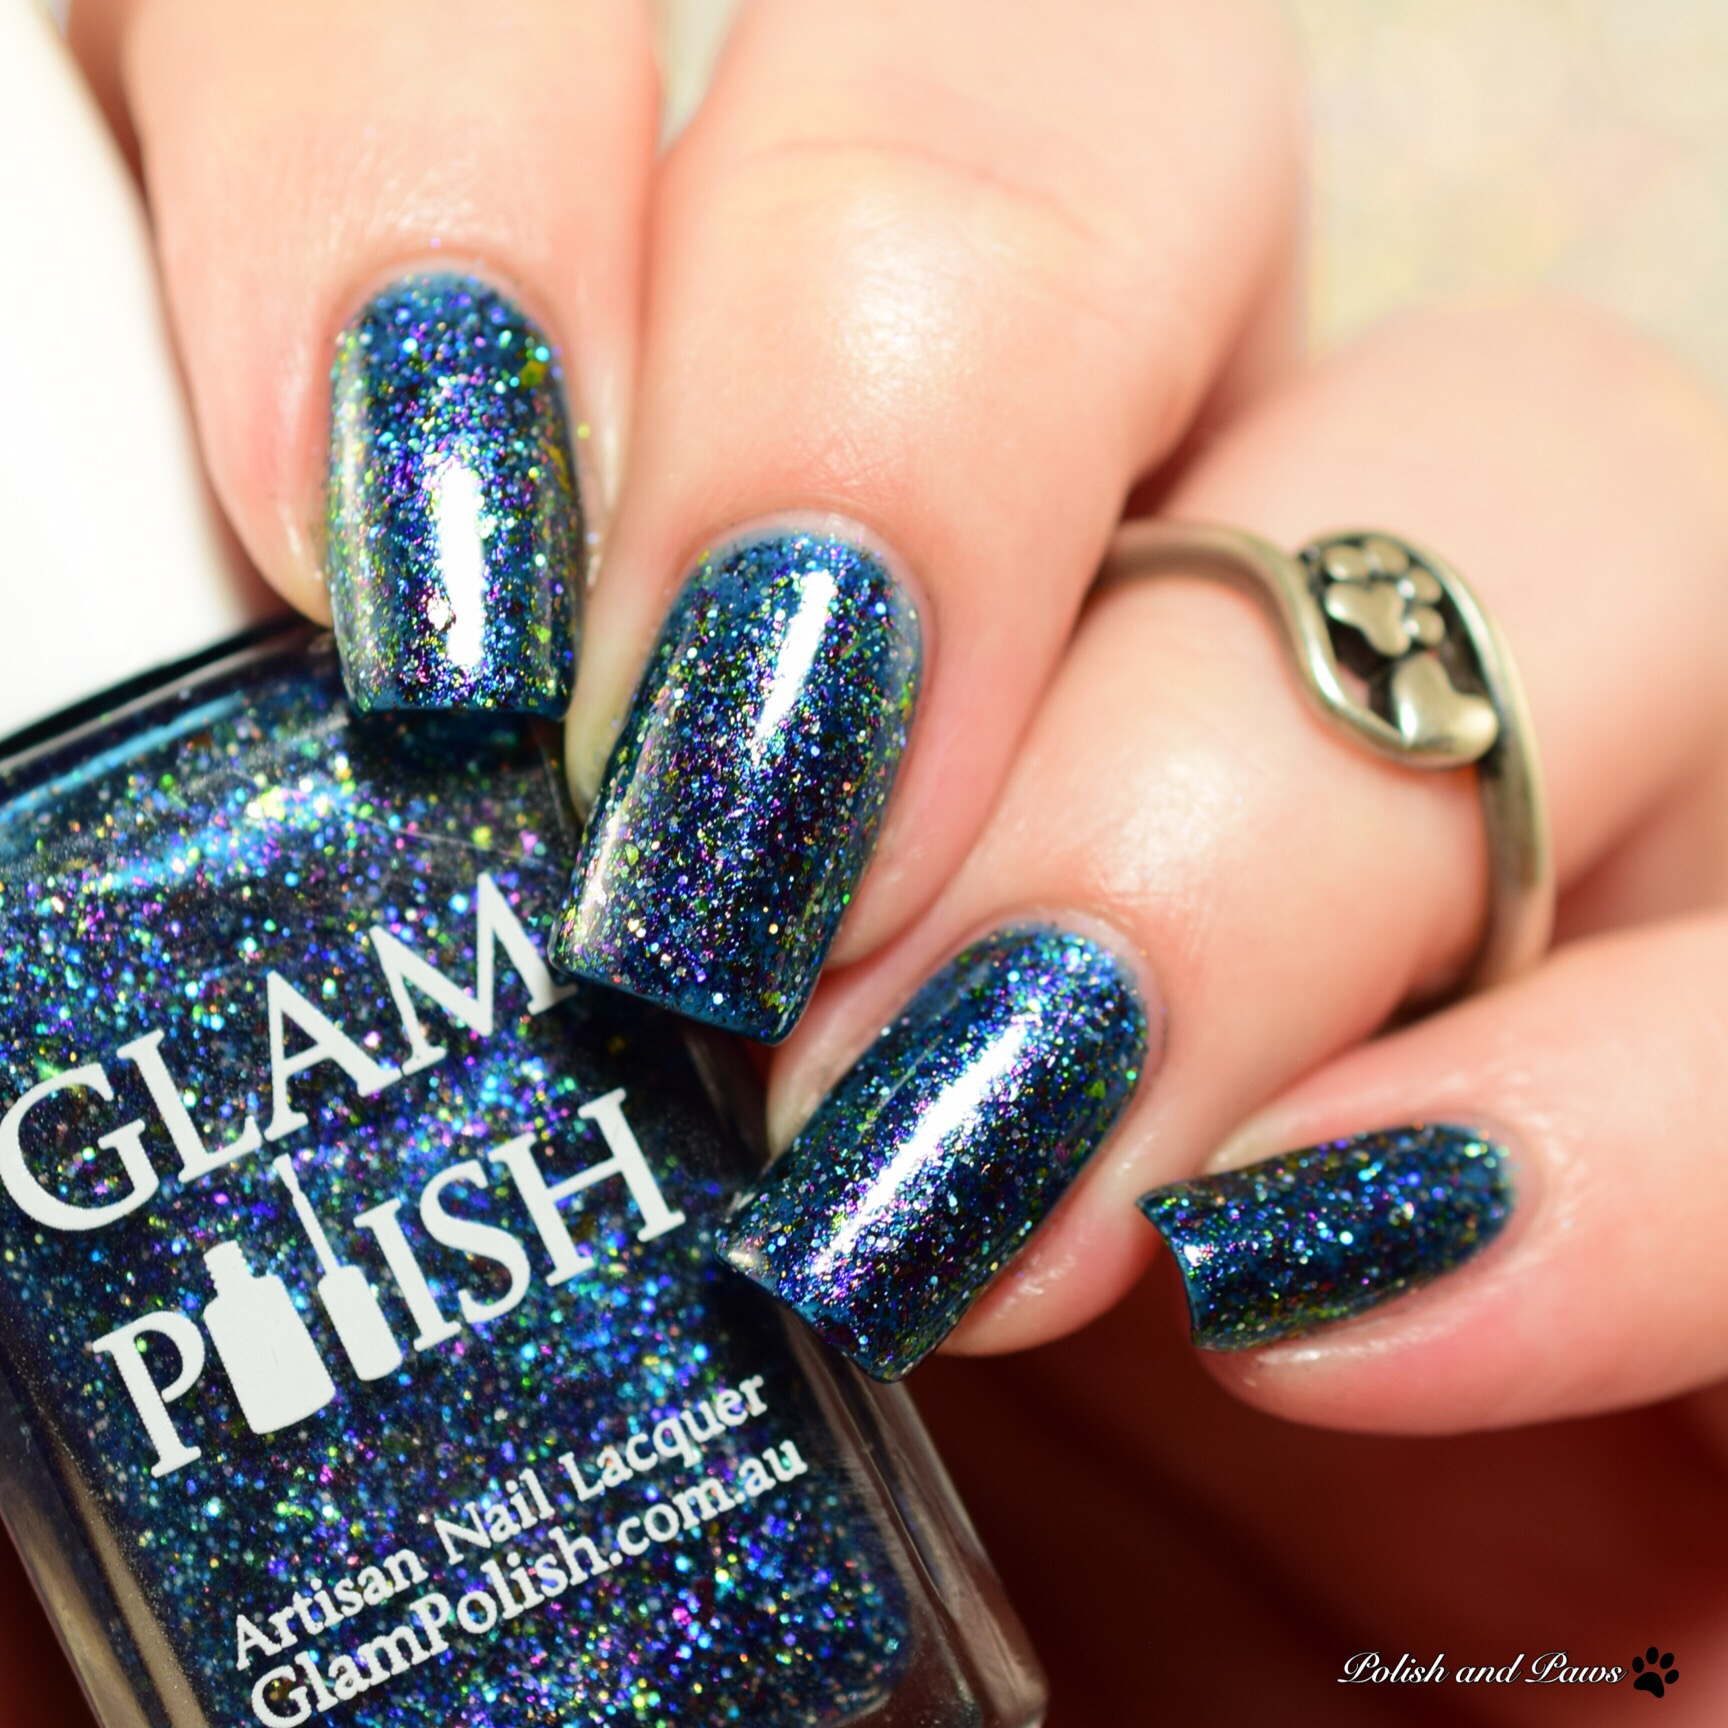 Glam Polish Junkchain